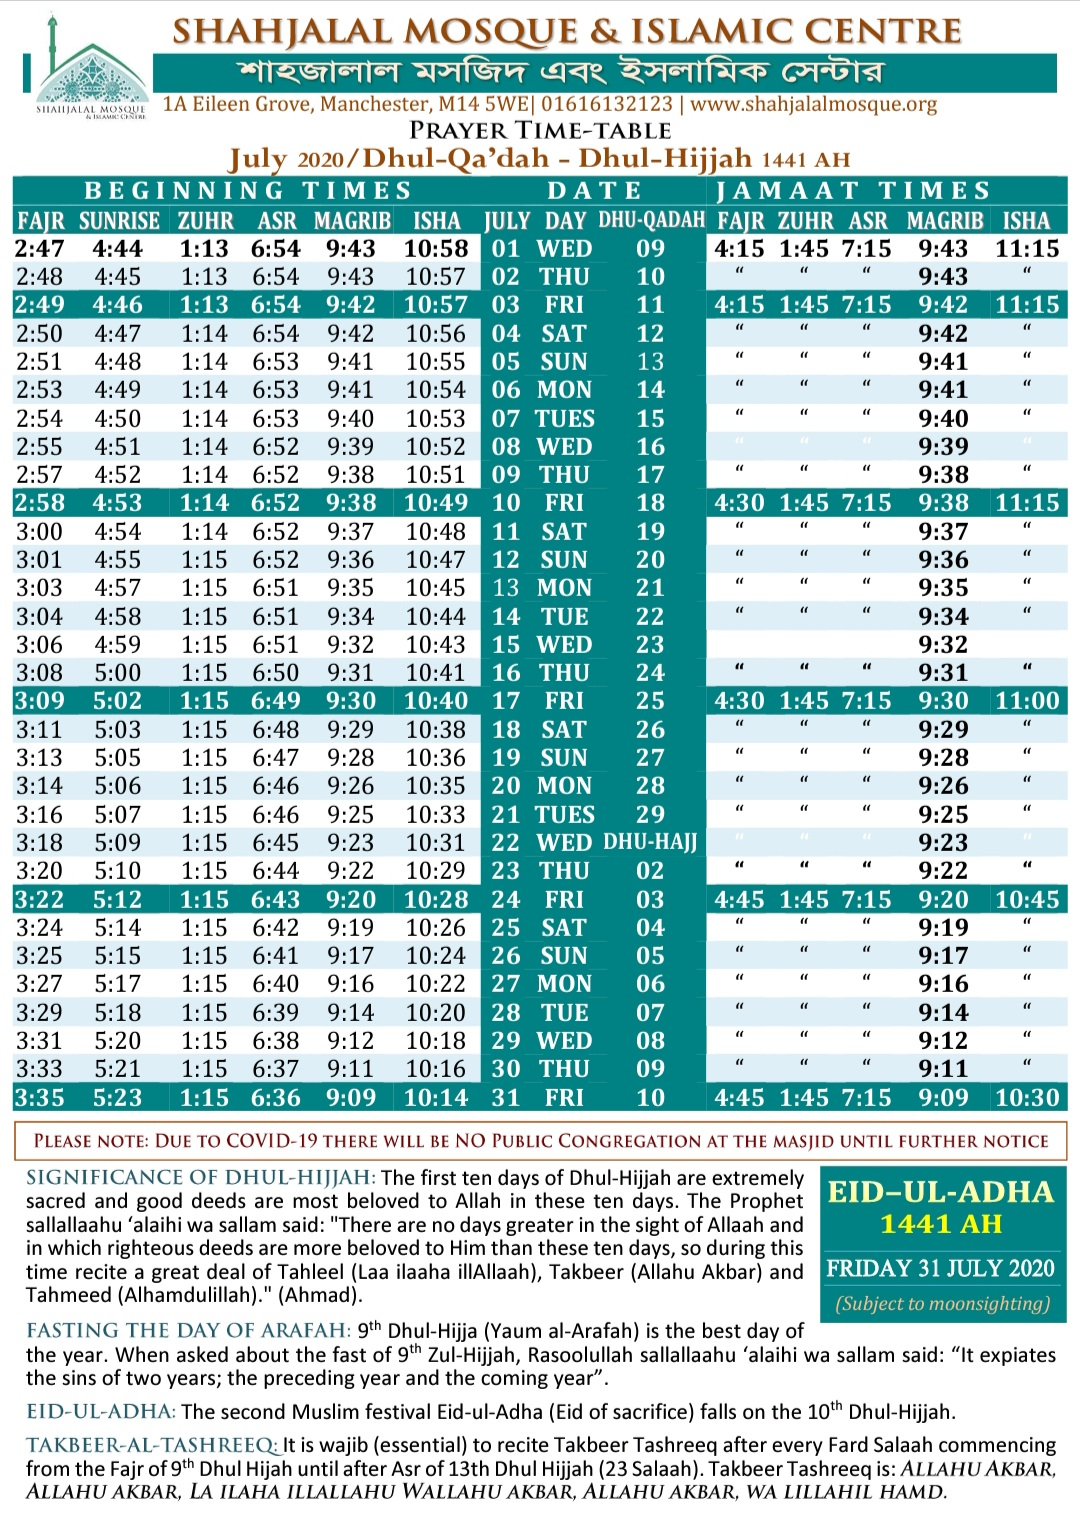 Prayer Timetable Manchester | July 2020